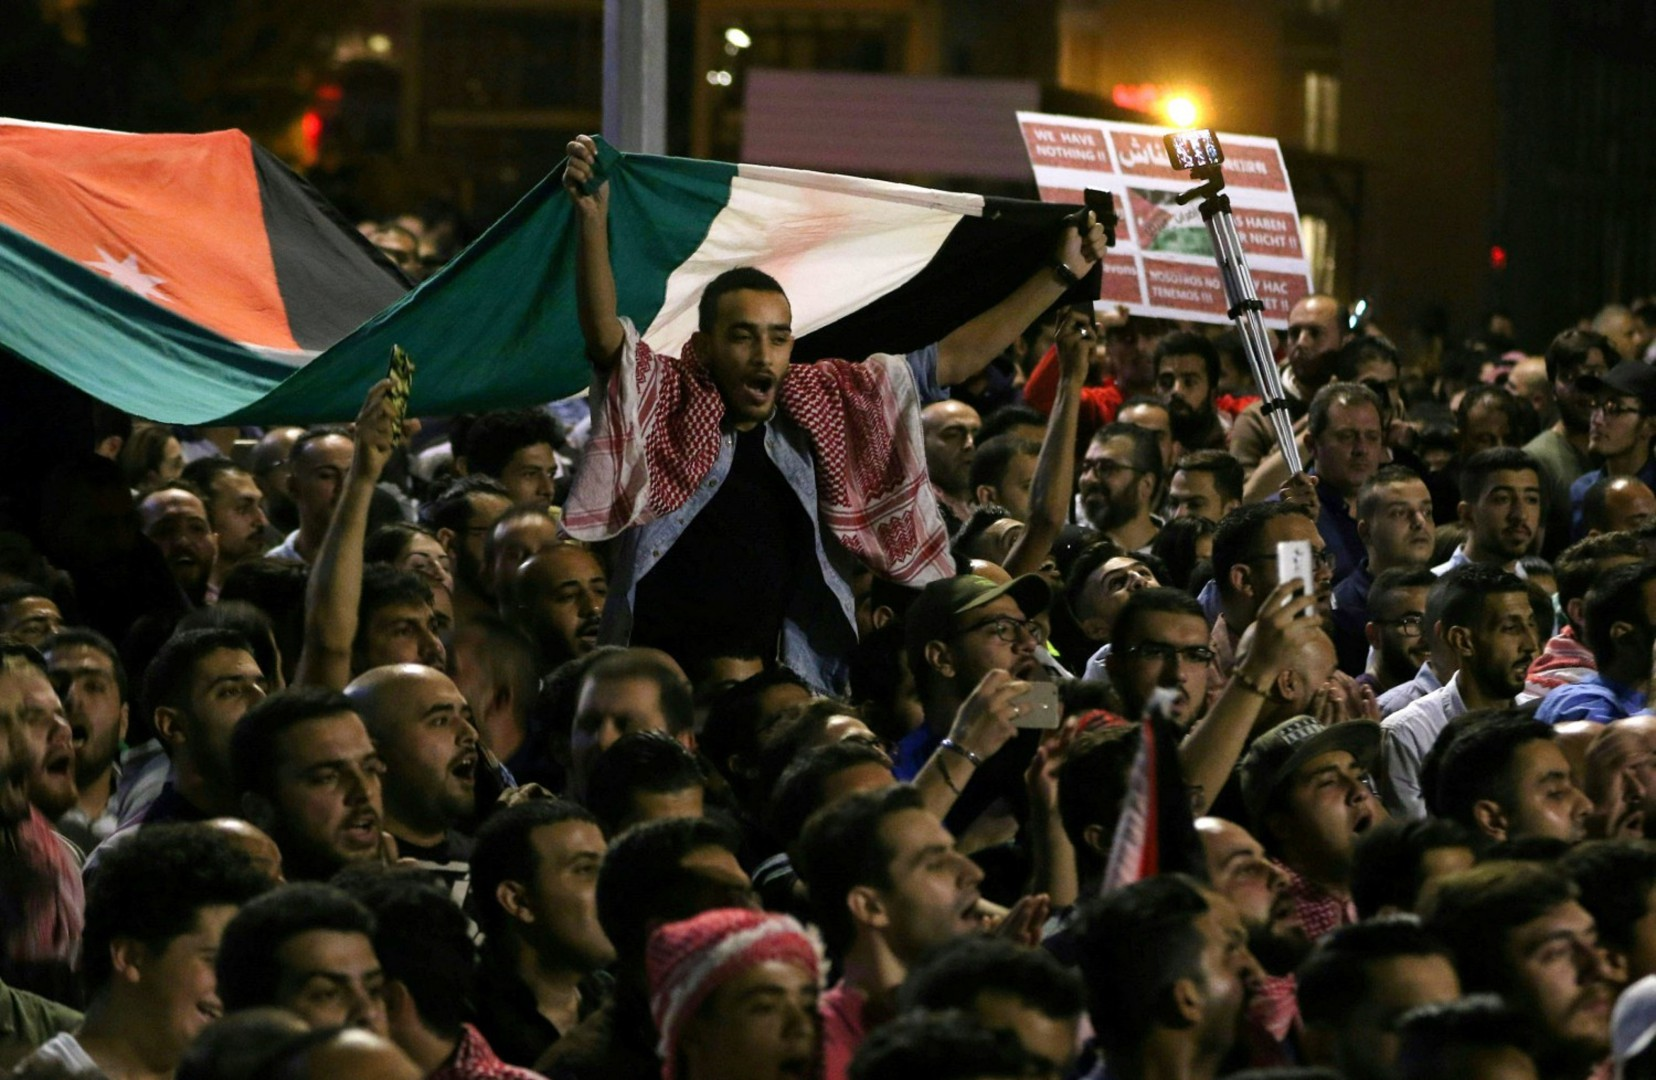 Proteste in Giordania (LaPresse)